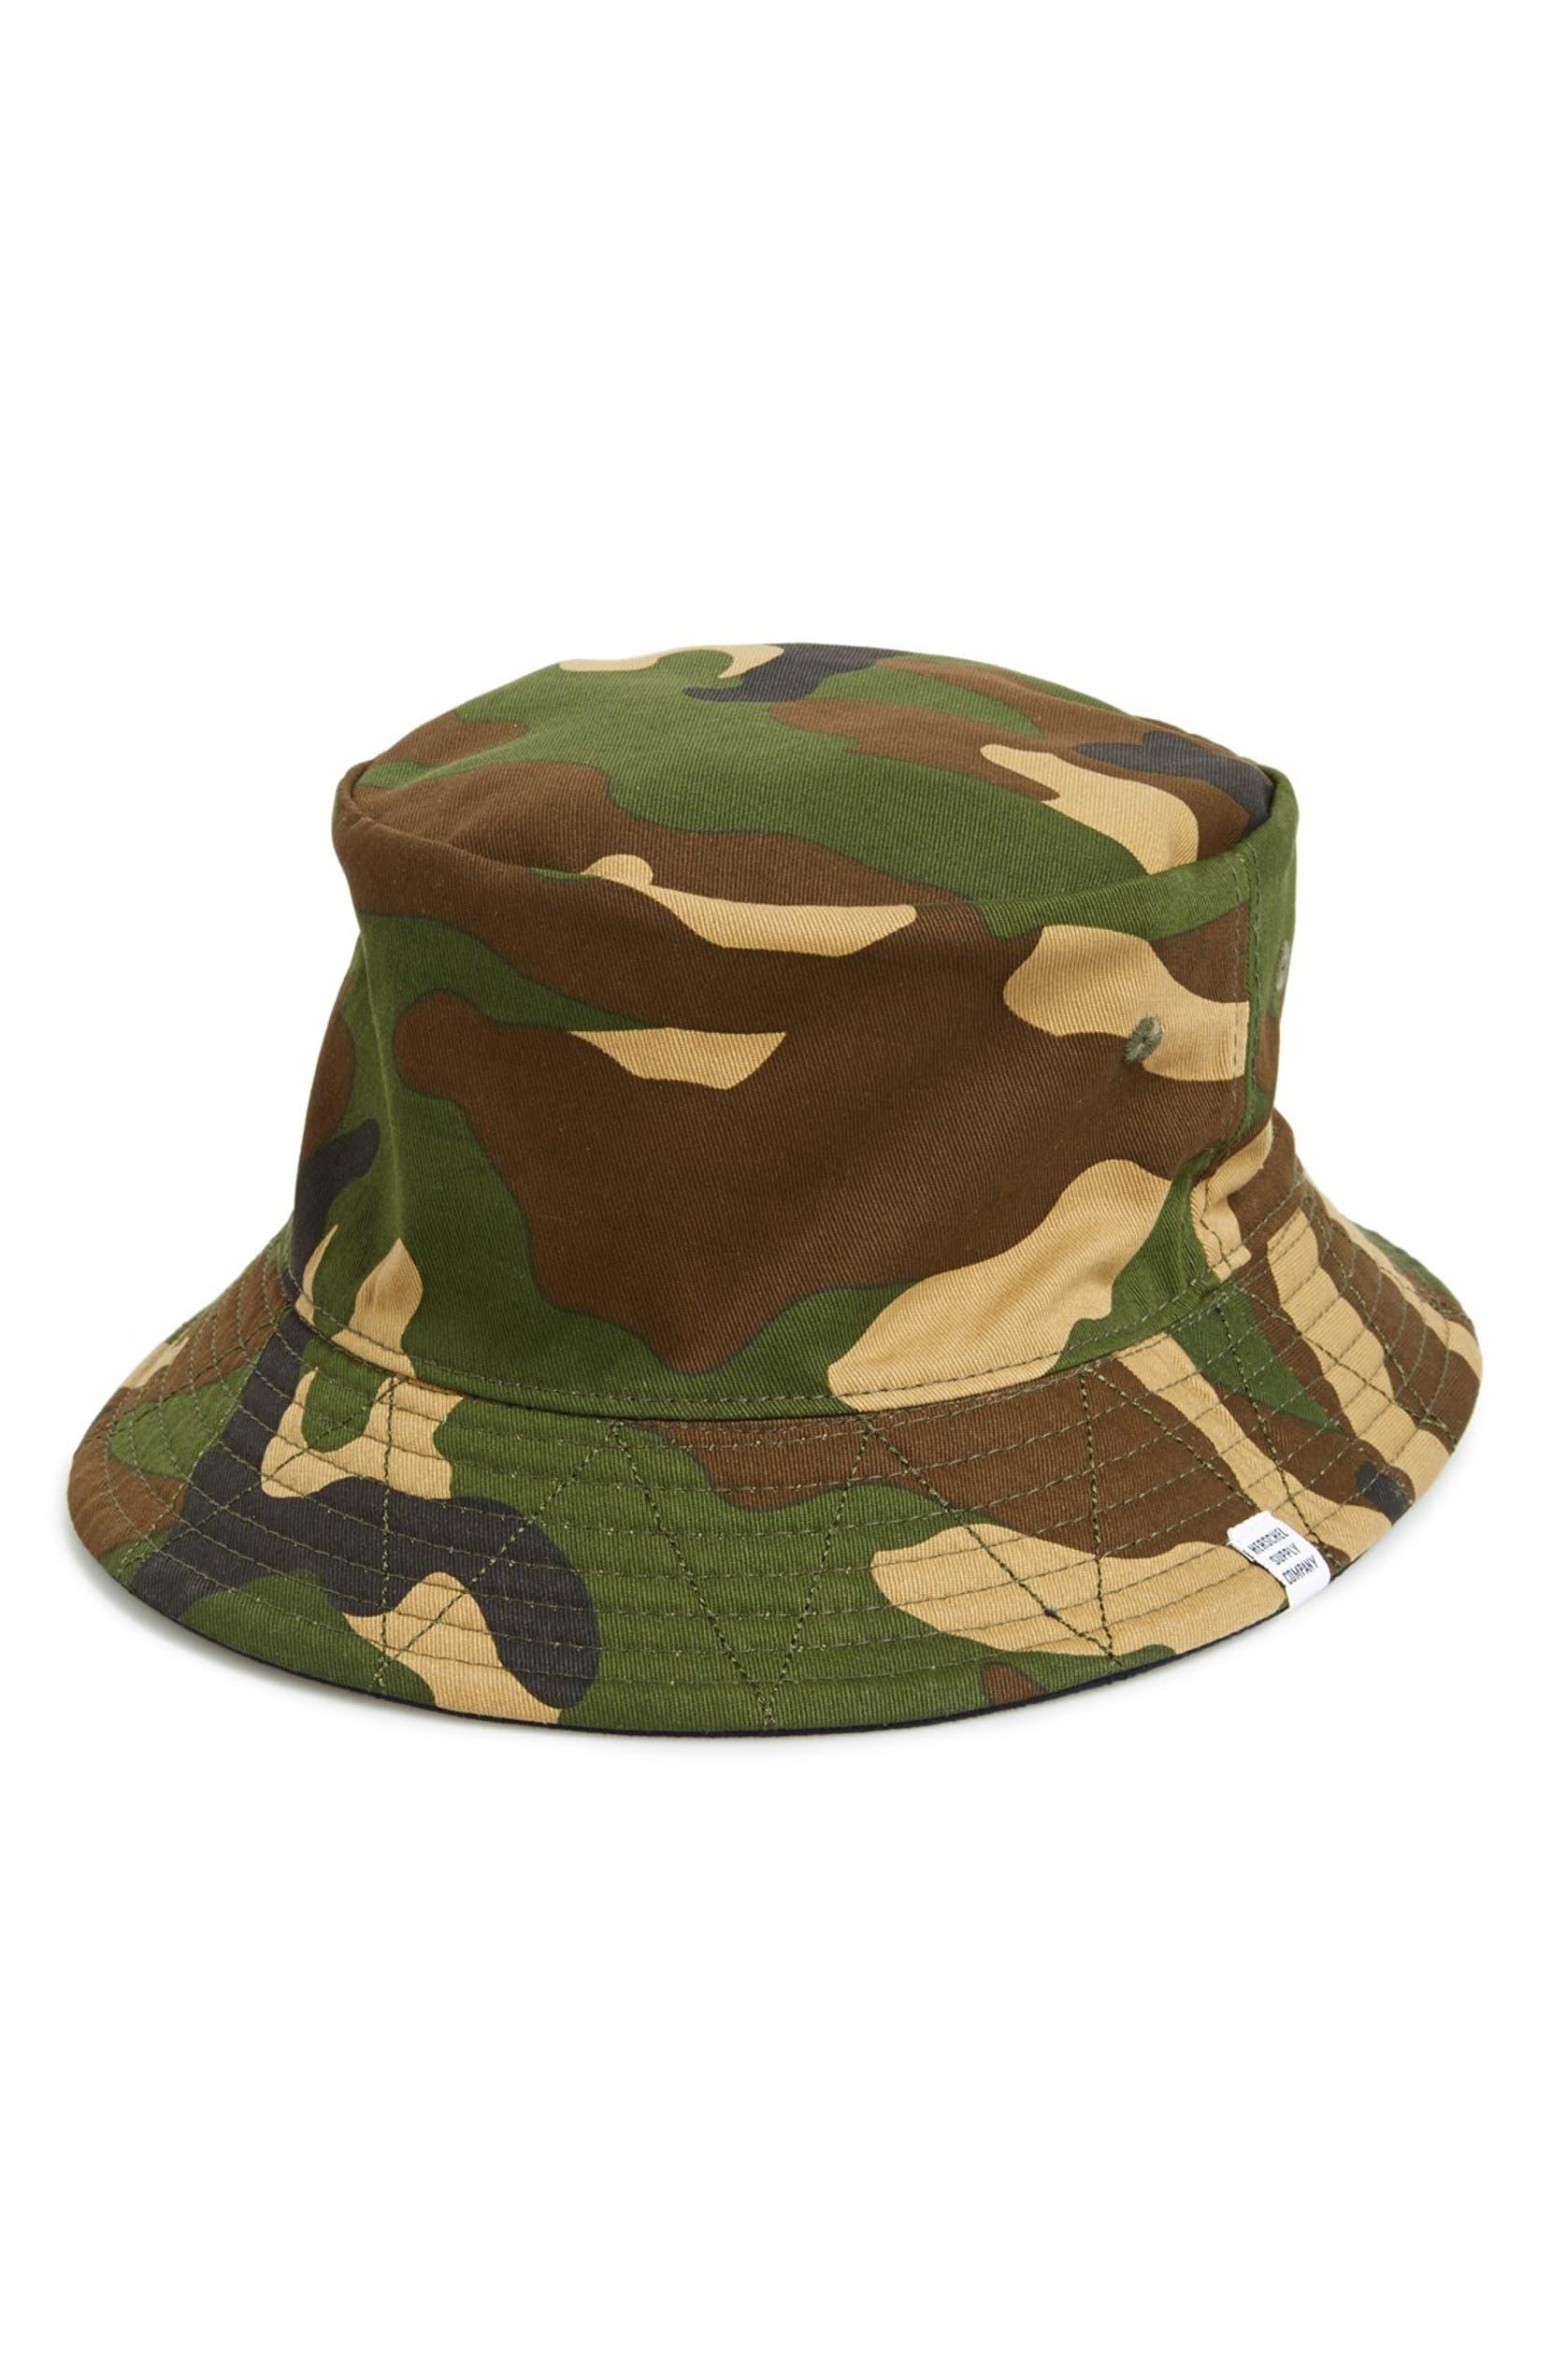 Herschel Supply Co.  Lake  Reversible Bucket Hat  a1b3d2c88f67